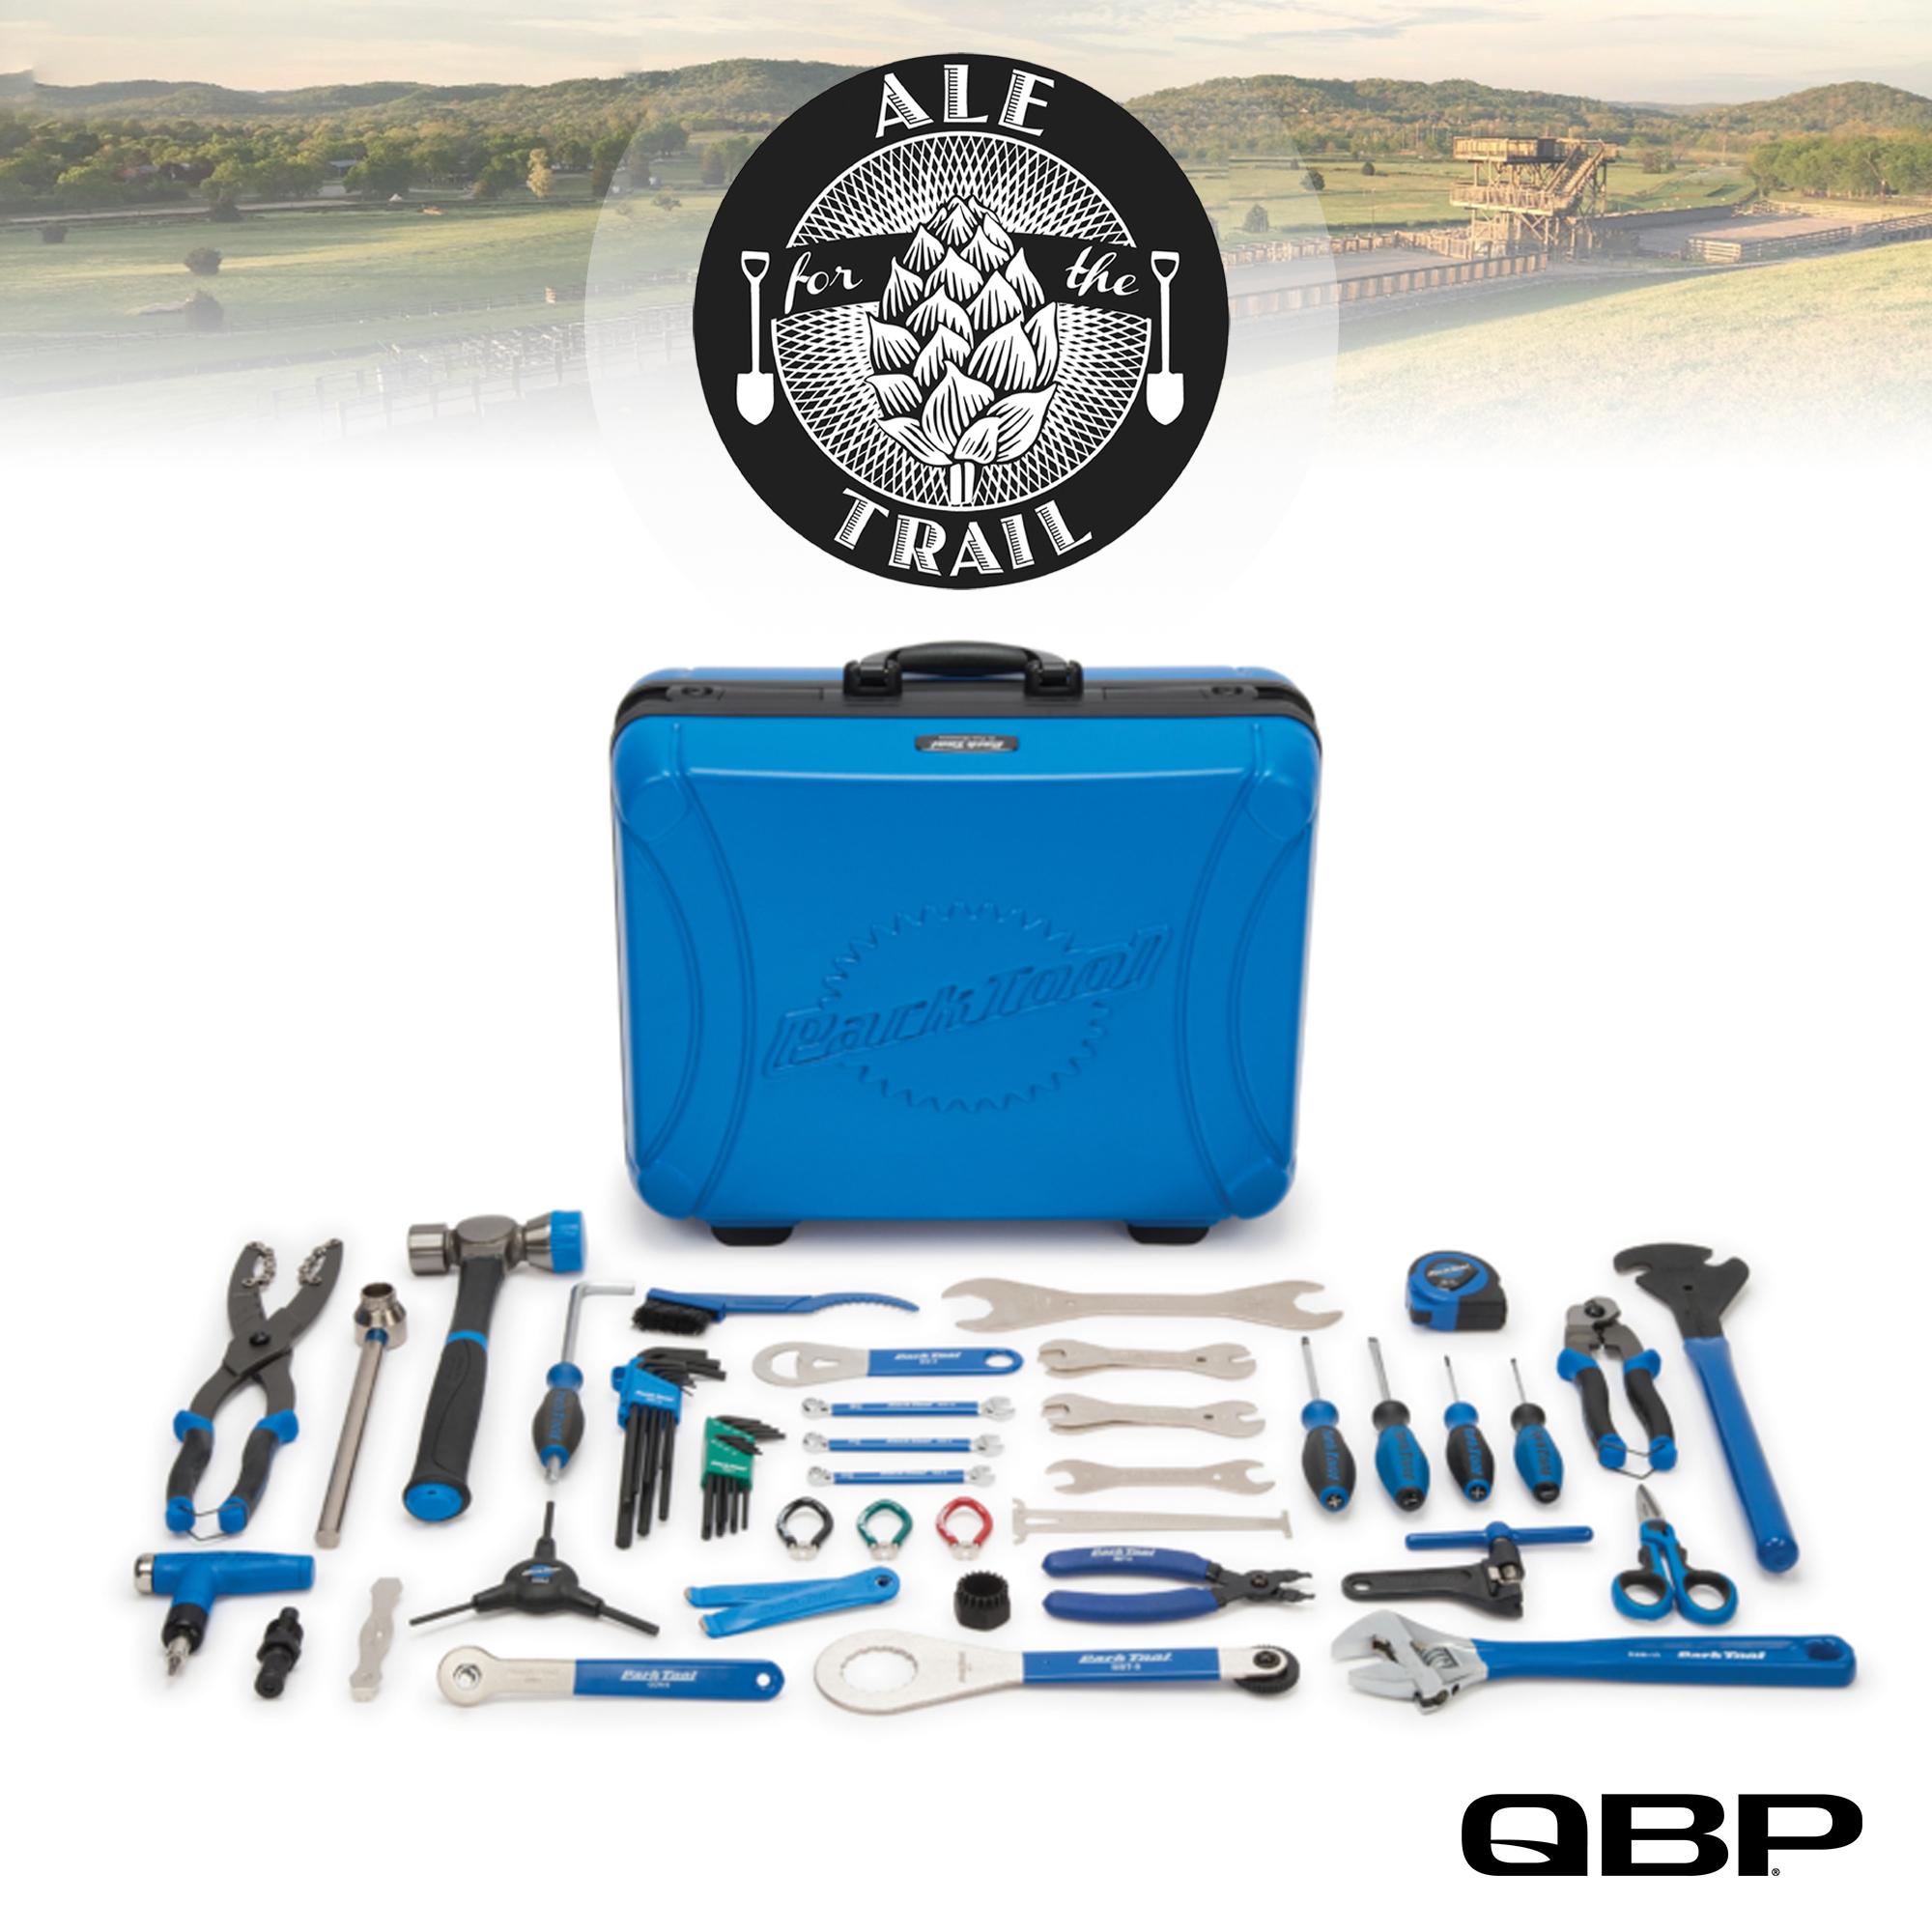 Park 65 piece Professional Tool Kit